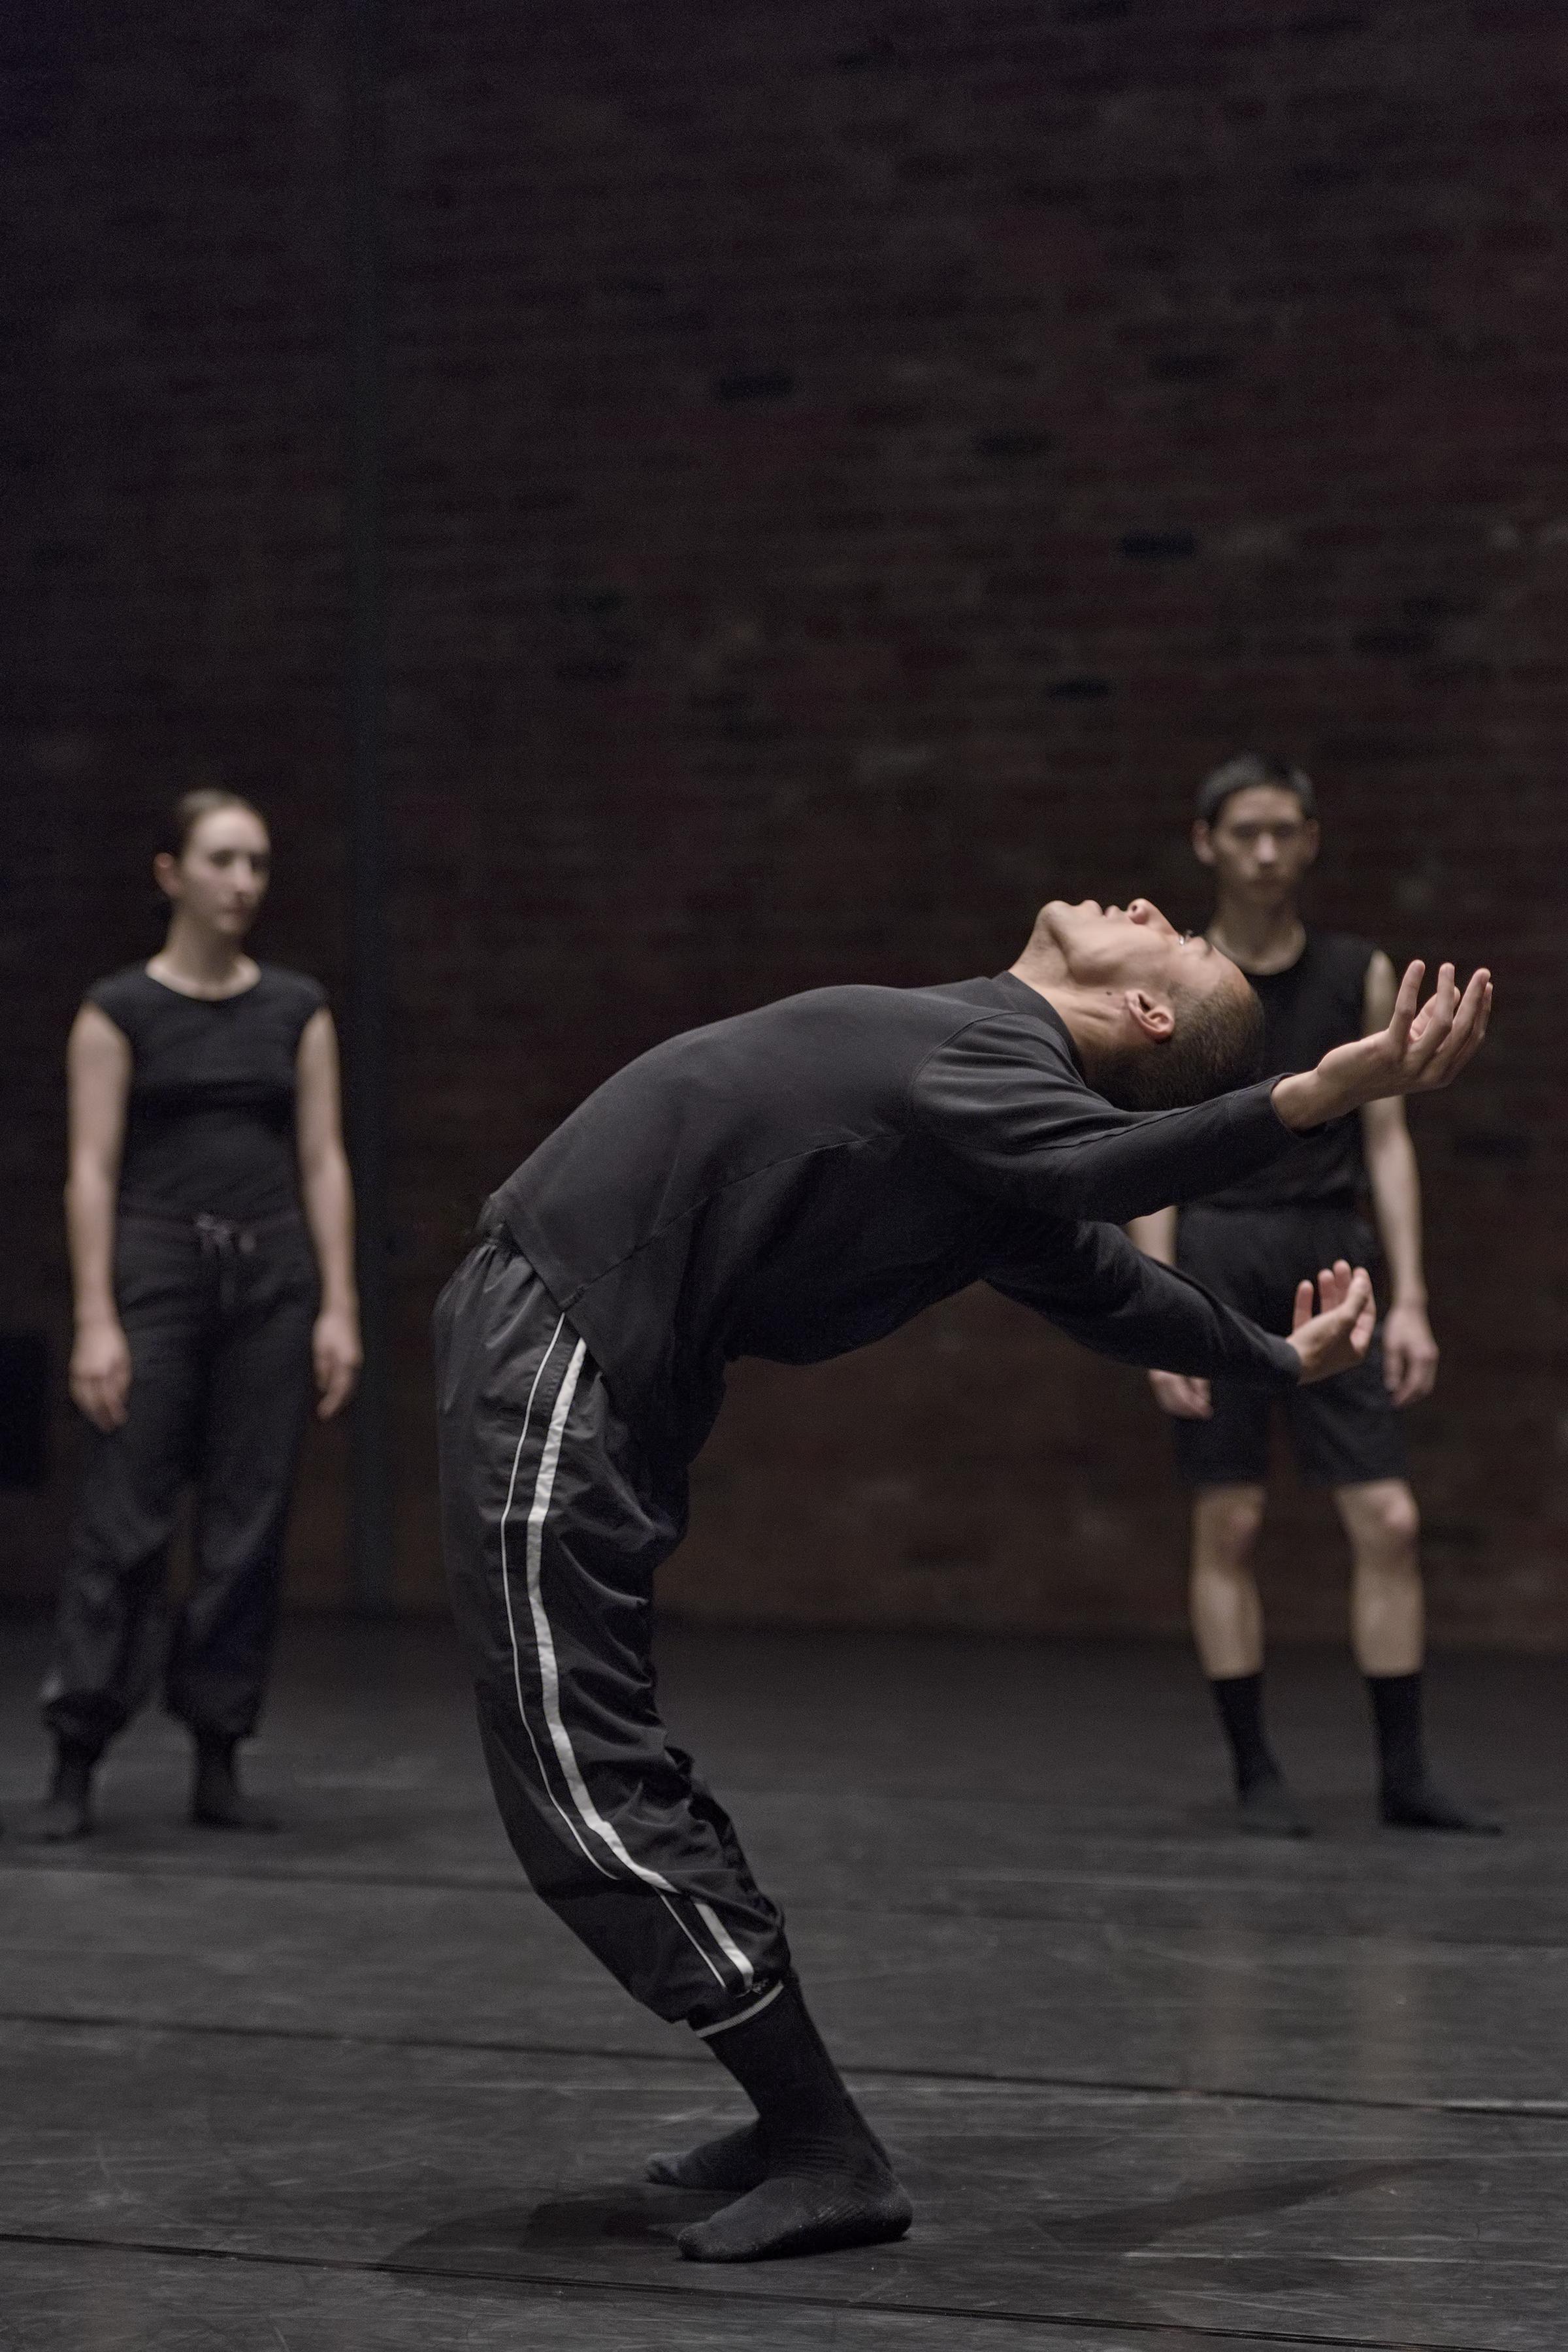 Photography by Michael Slobodian of dancer Morgan Bobrow-Williams for 'big kid'